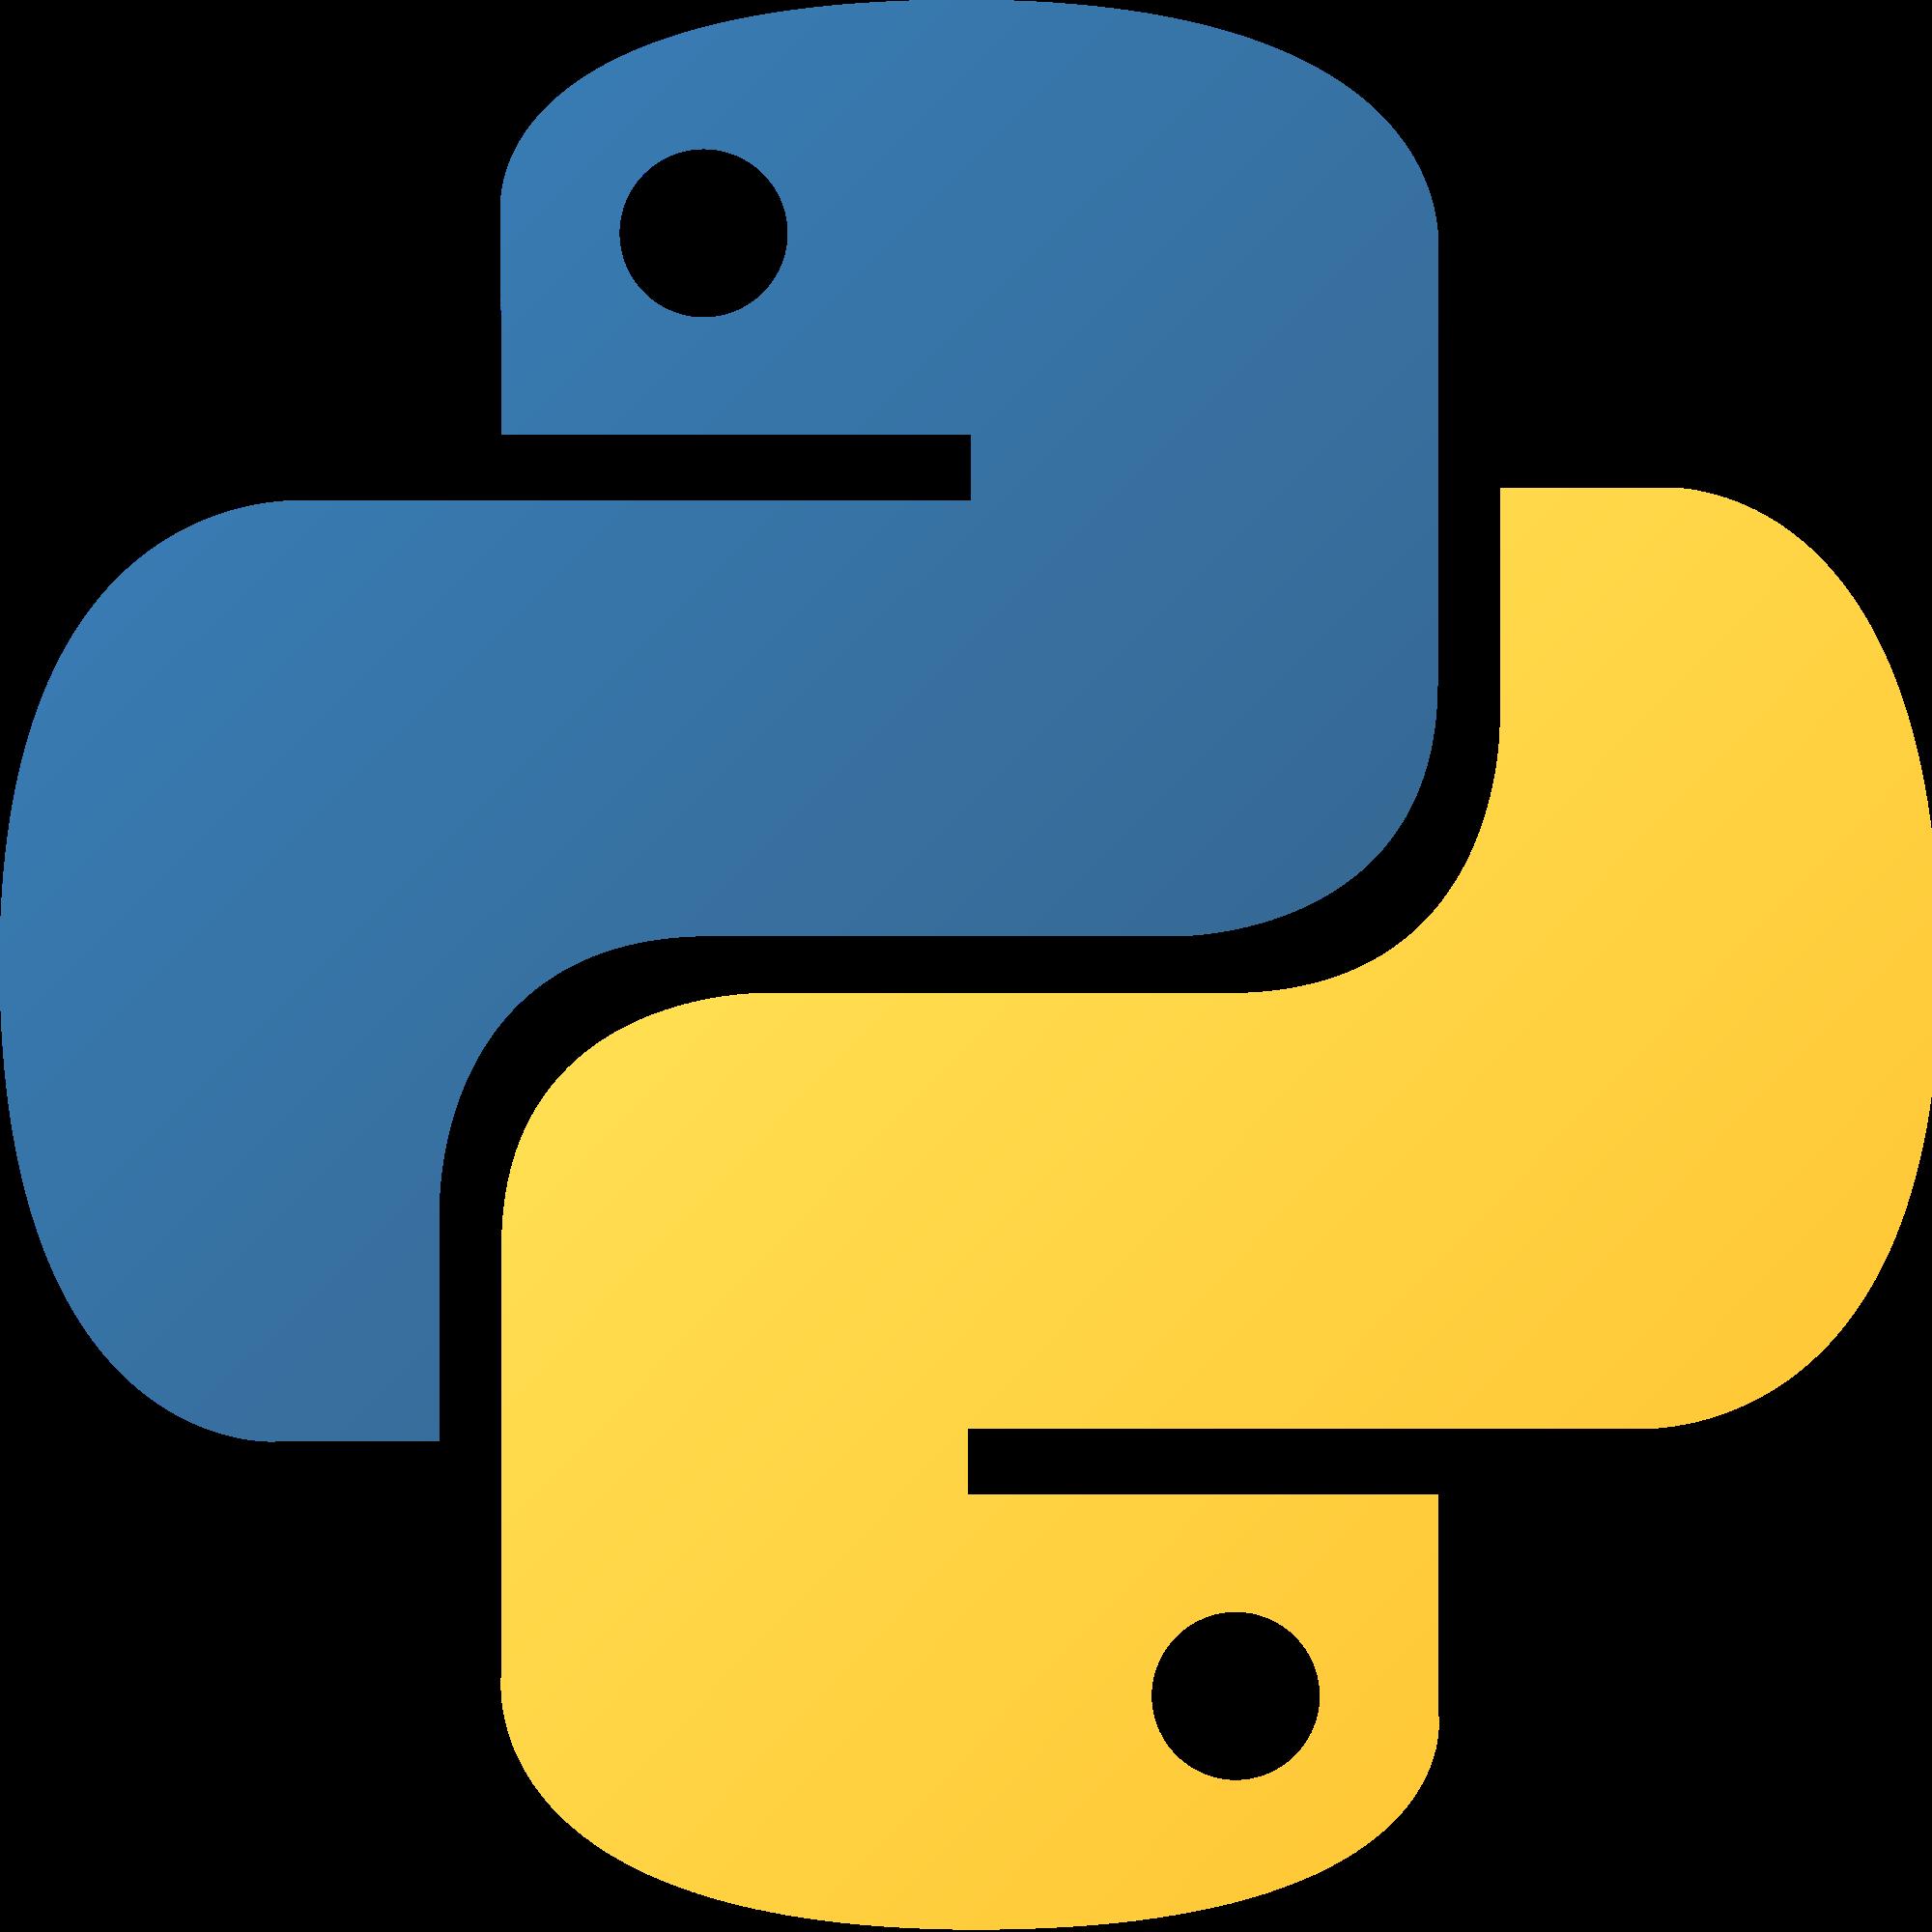 PythonLogo.png